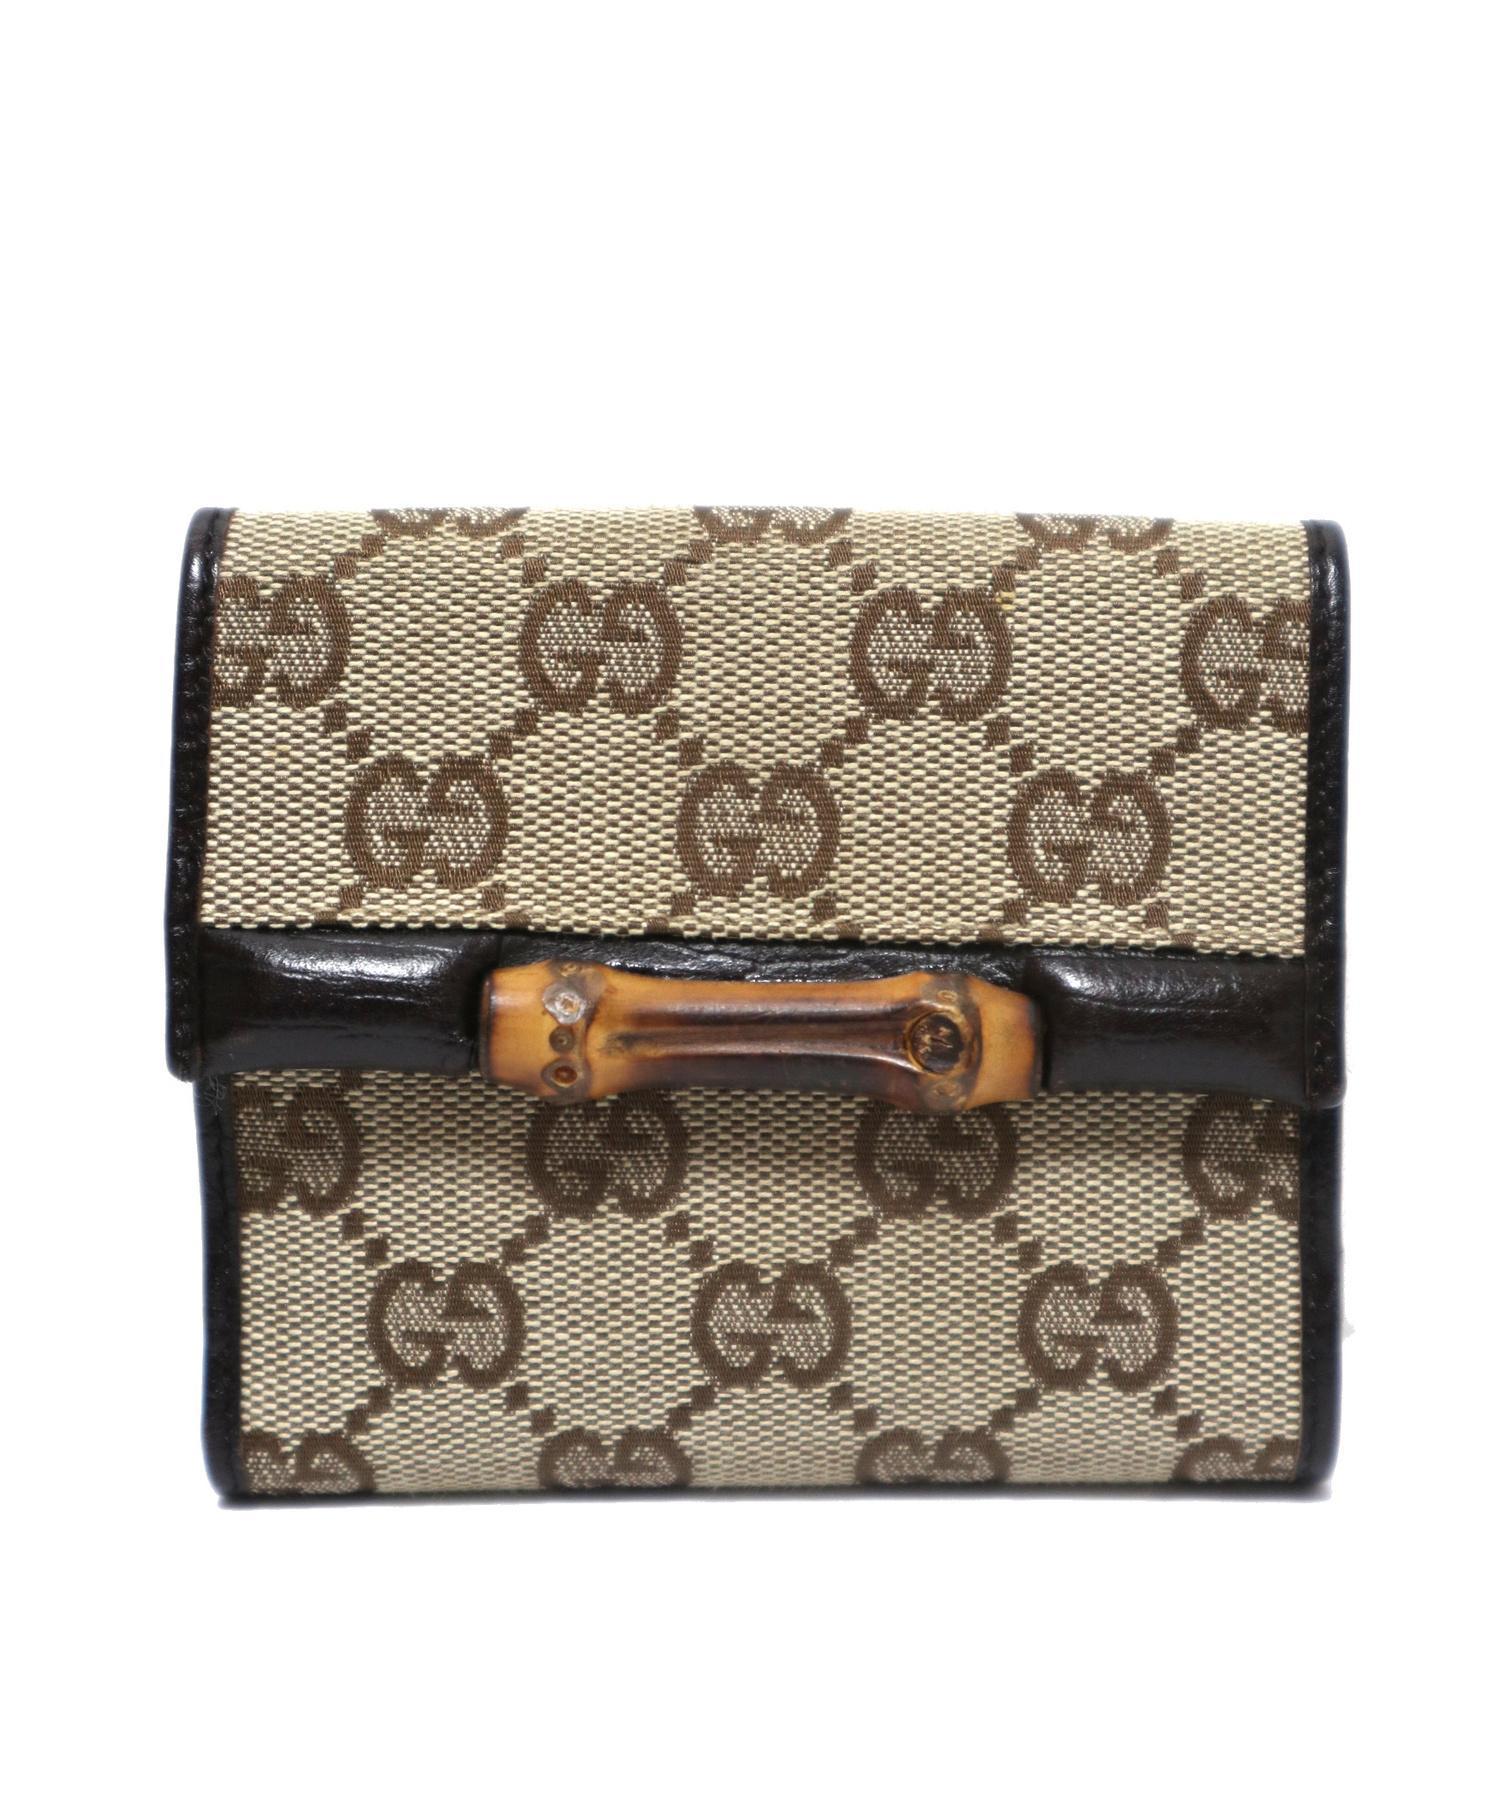 reputable site 4dd67 d0e52 [中古]GUCCI(グッチ)のメンズ 服飾小物 2つ折り財布